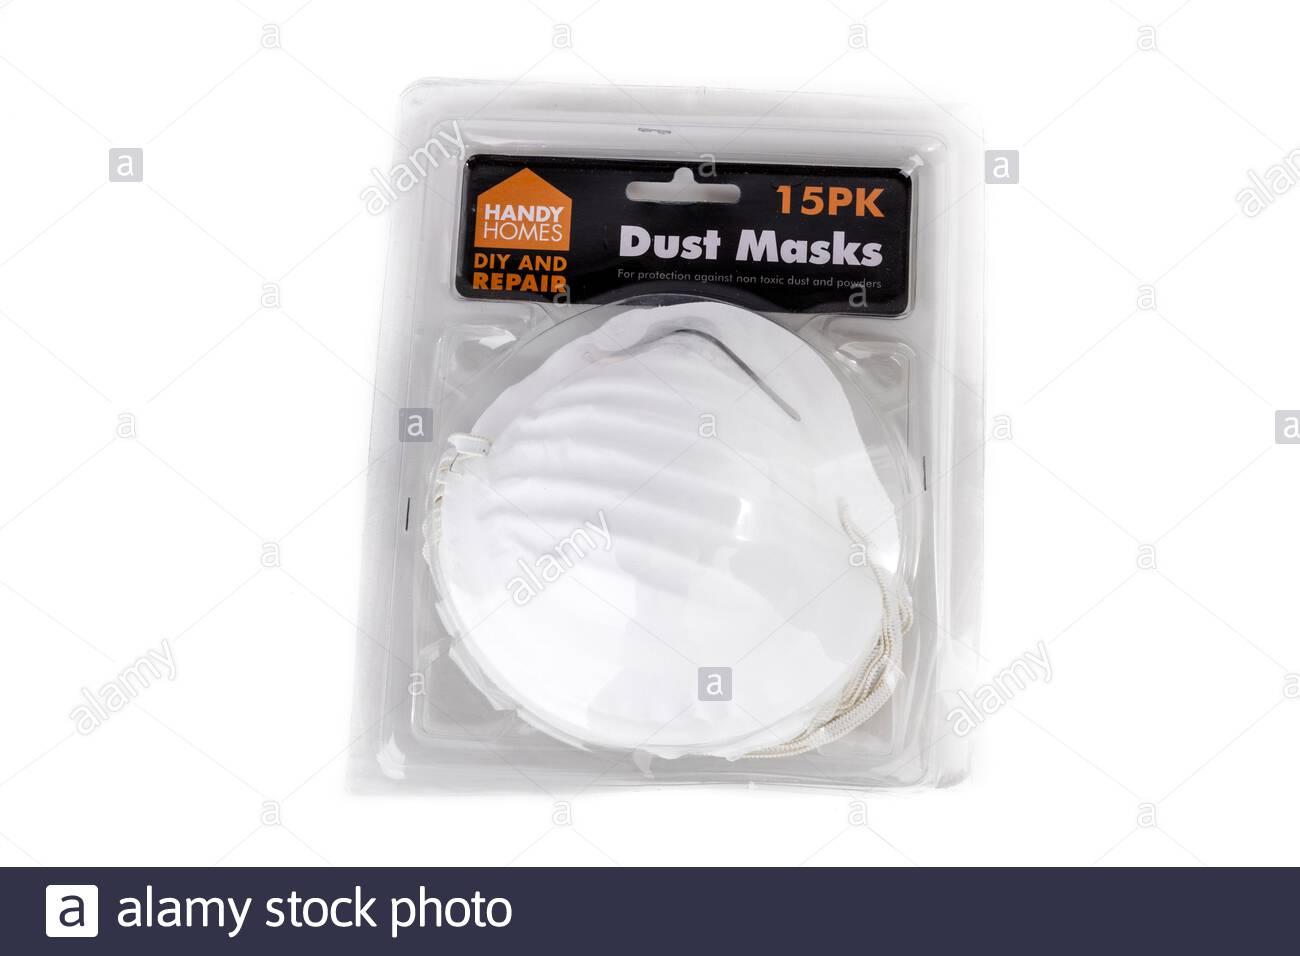 dust-masks-face-masks-ppe-masks-ppe-masks-pack-masks-packet-diy-face-masks-dust-mask-protectio...jpg